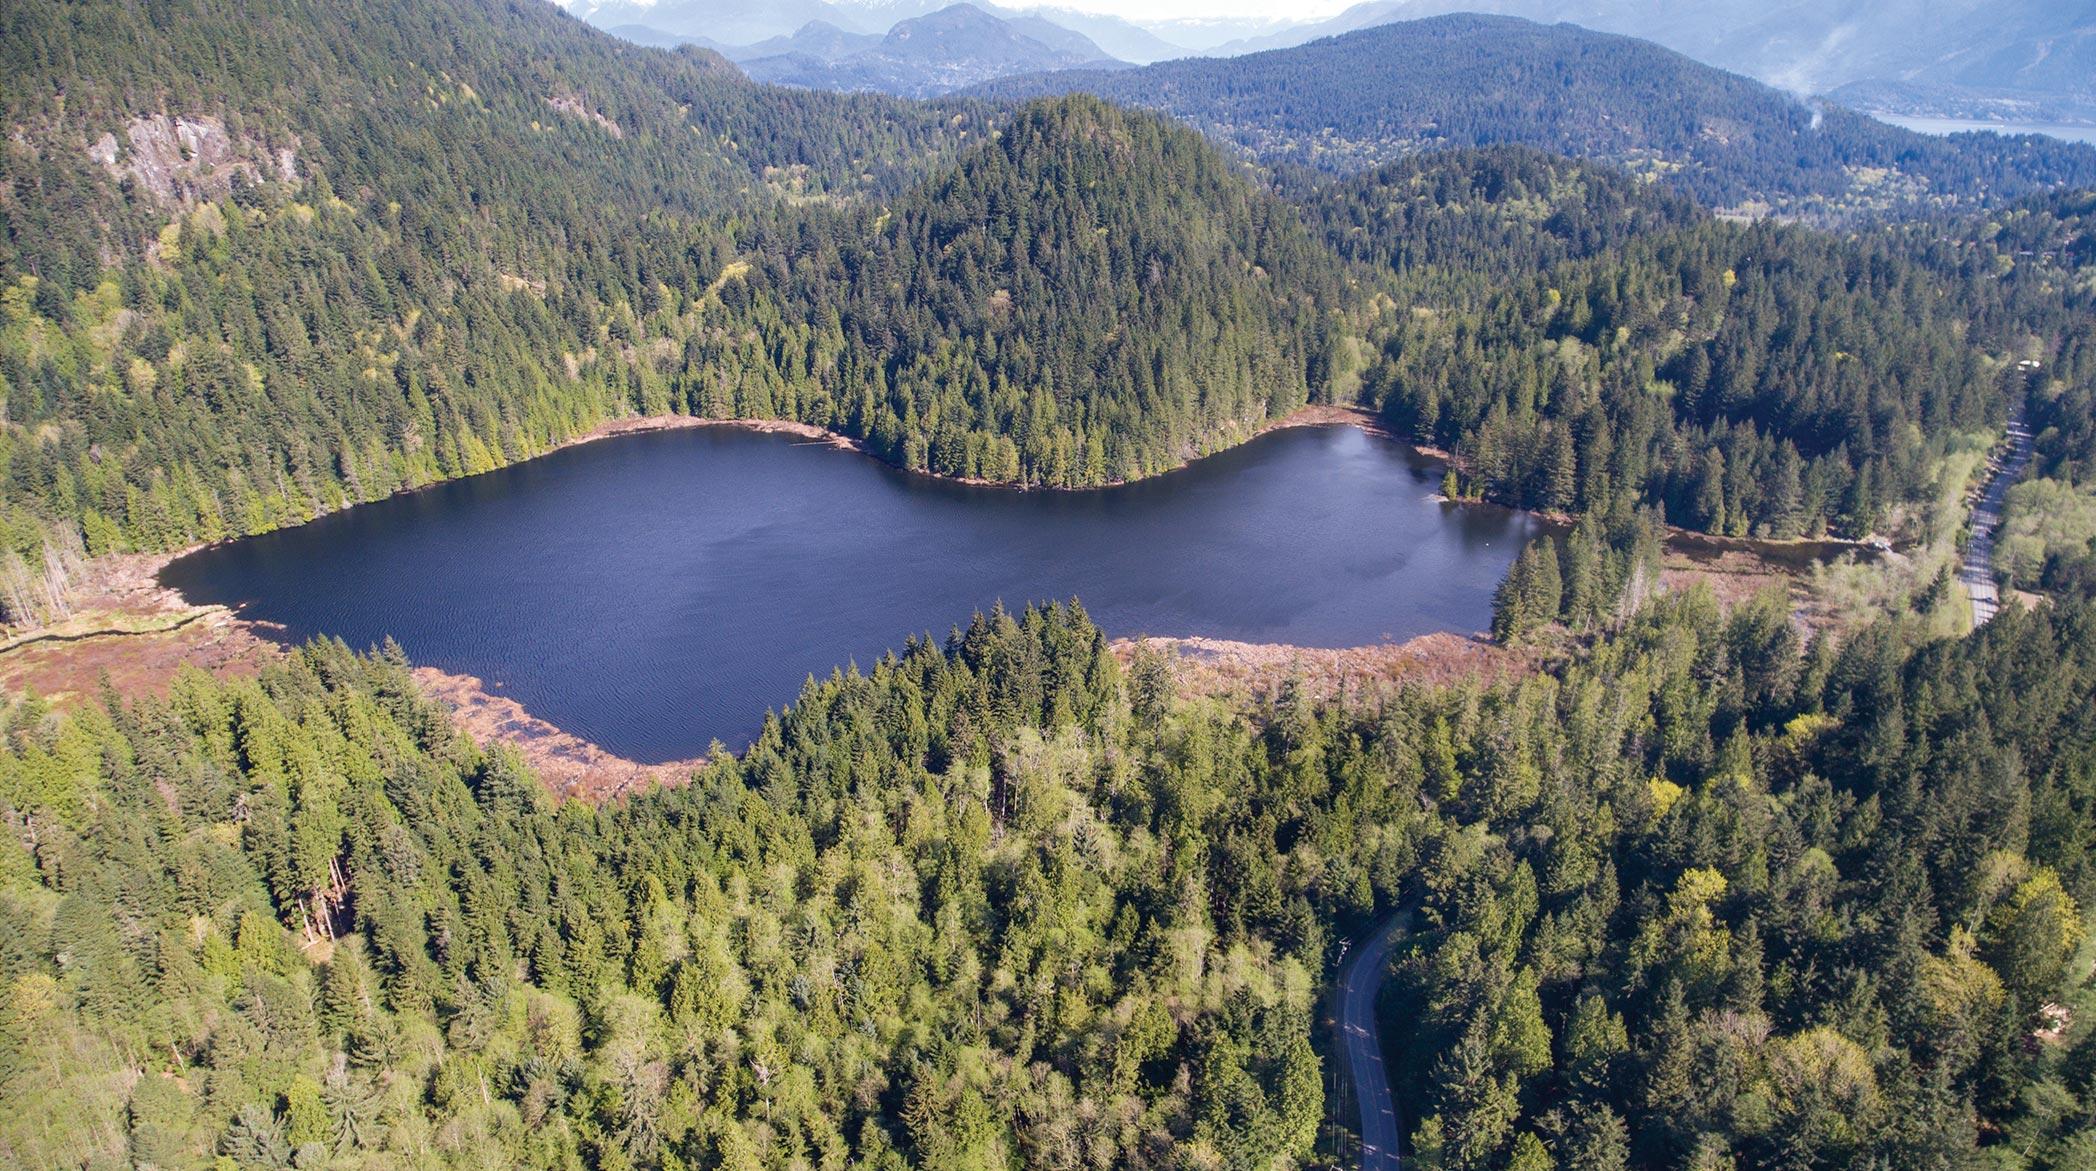 A dark blue lake set in green hills covered in coniferous rainforest.